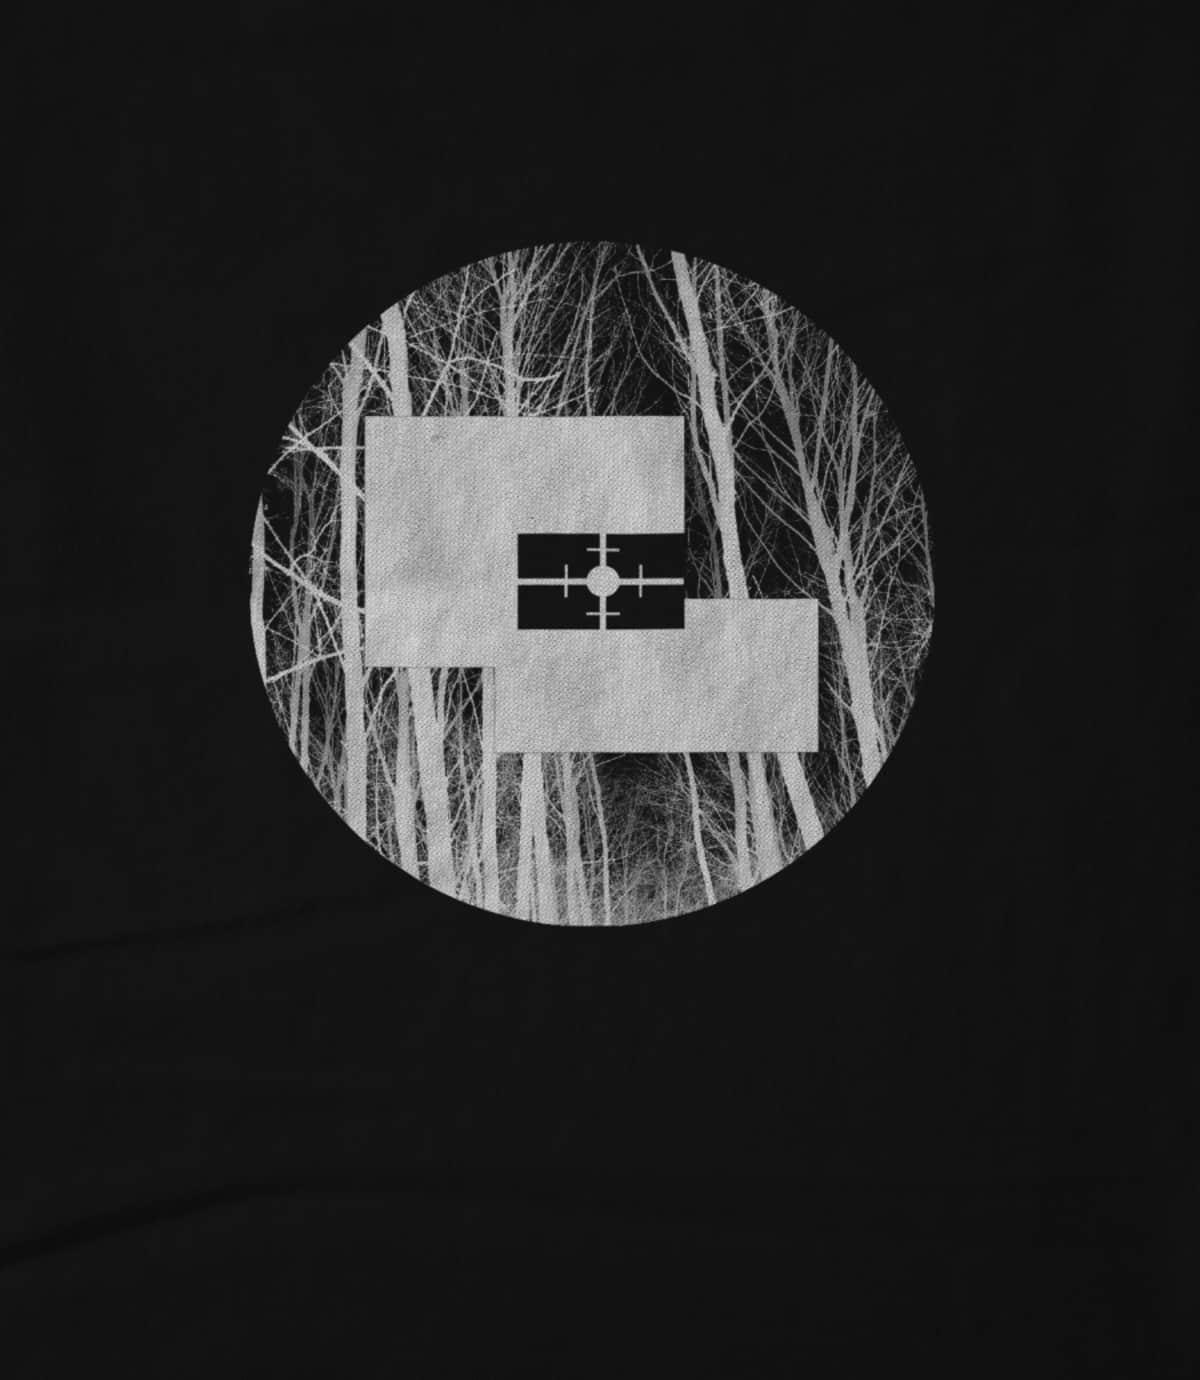 Conspired within music conspired within music   forest logo t shirt 1550544268